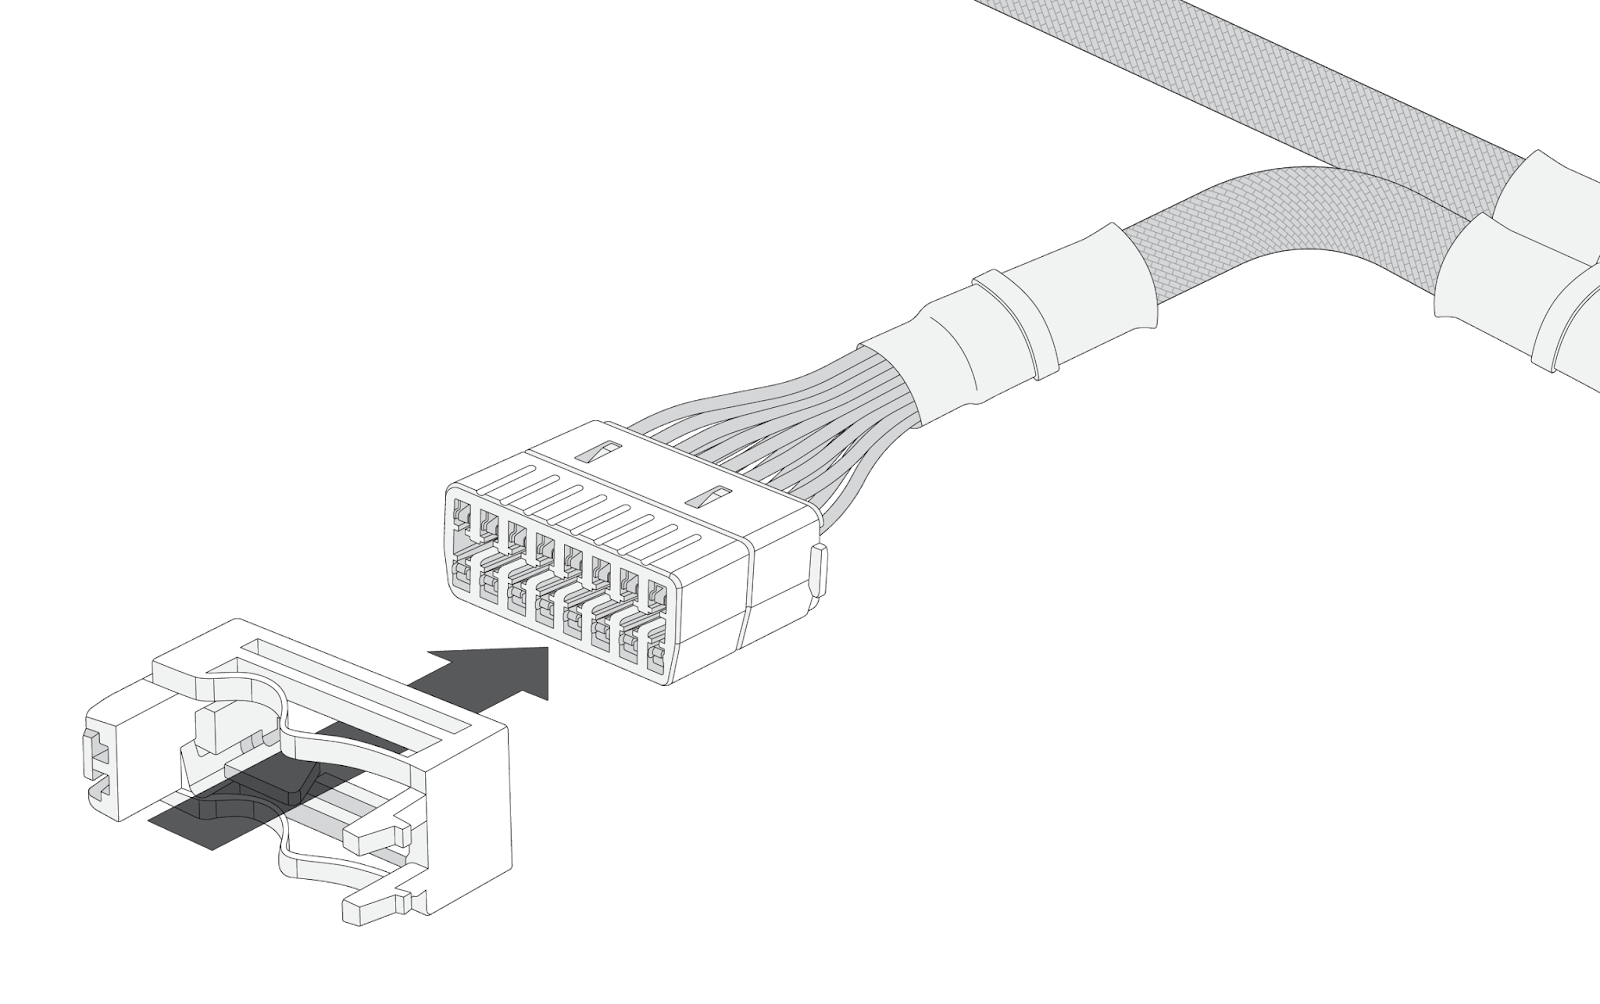 universal-harness-setup-figure11.png